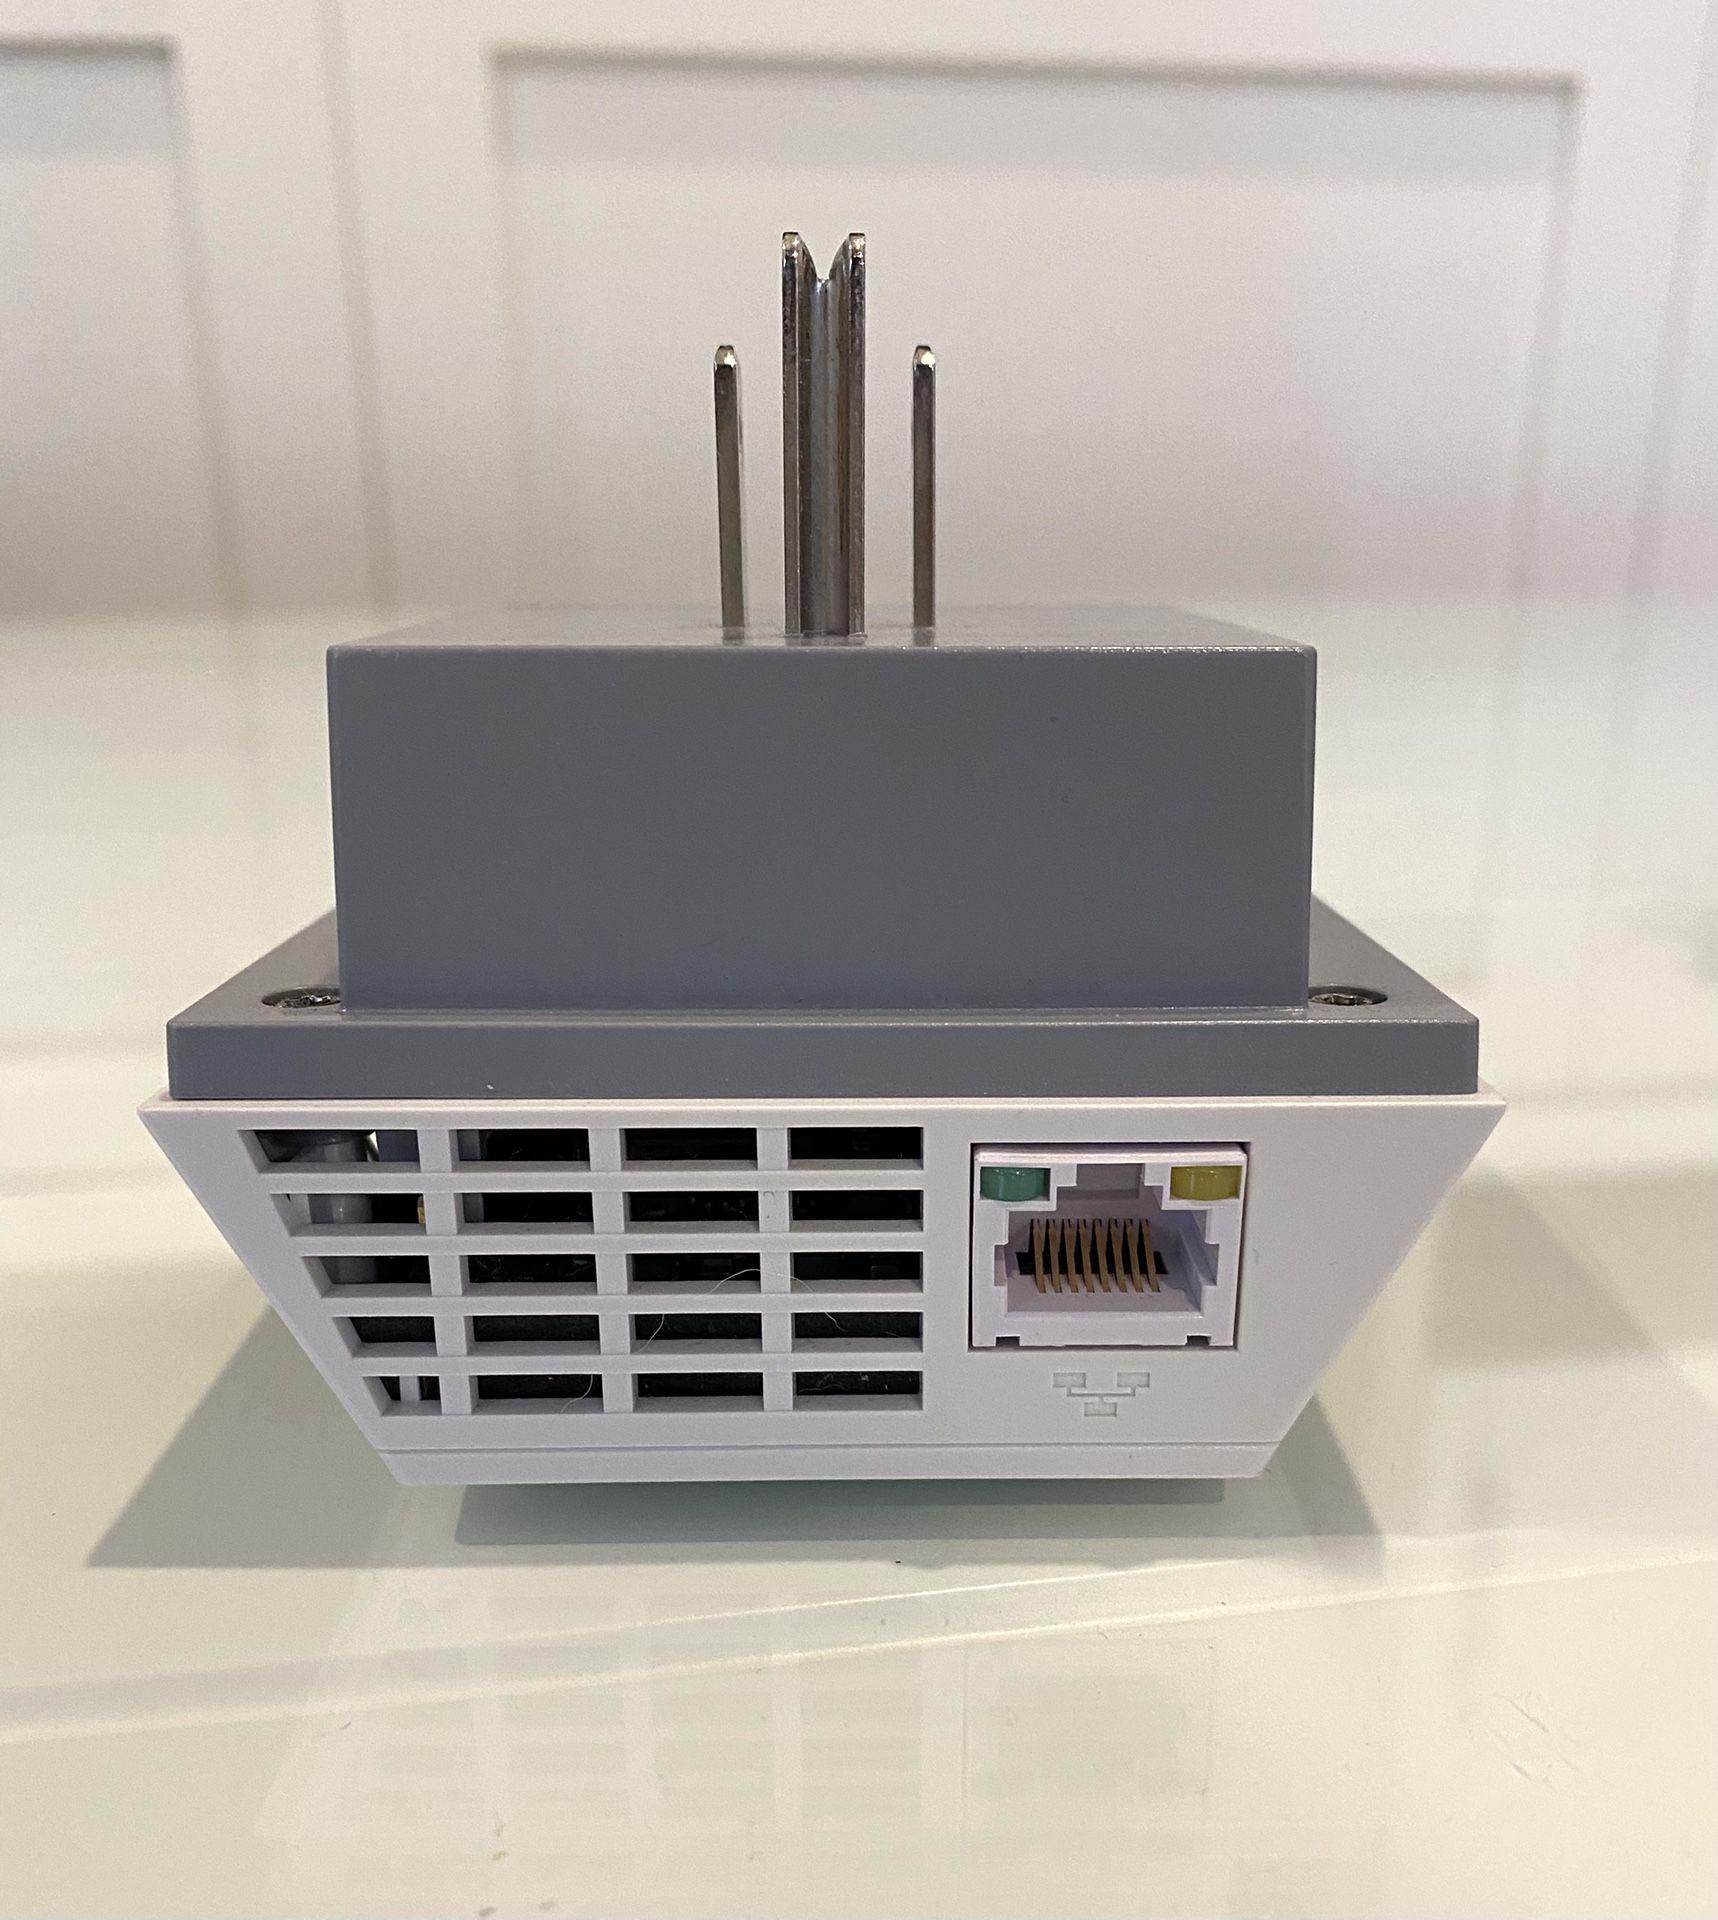 NETGEAR Nighthawk X4 AC2200 WiFi Range Extender